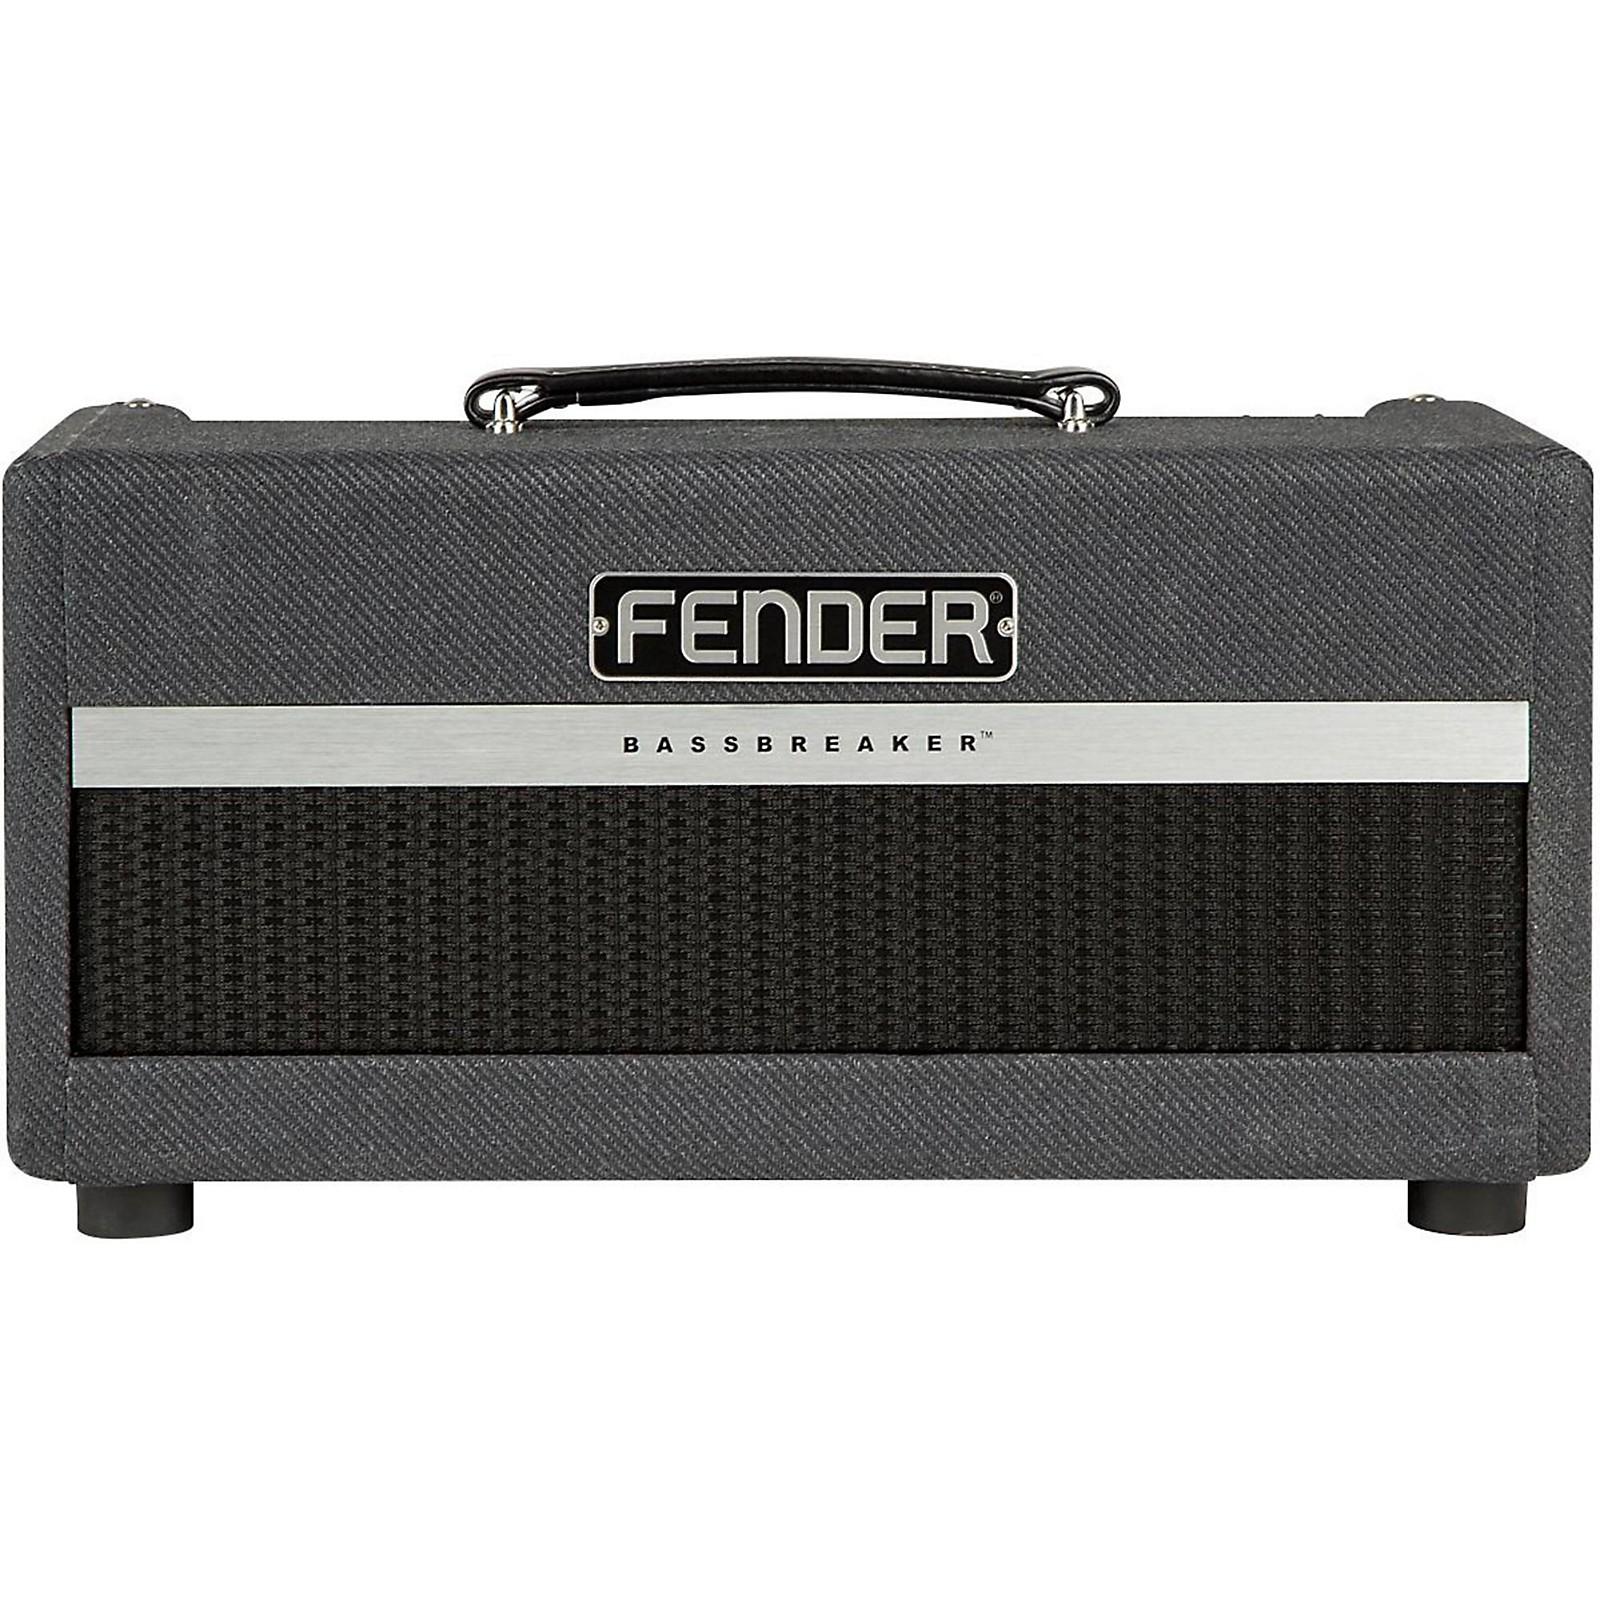 Open Box Fender Bassbreaker 15W Tube Guitar Amp Head